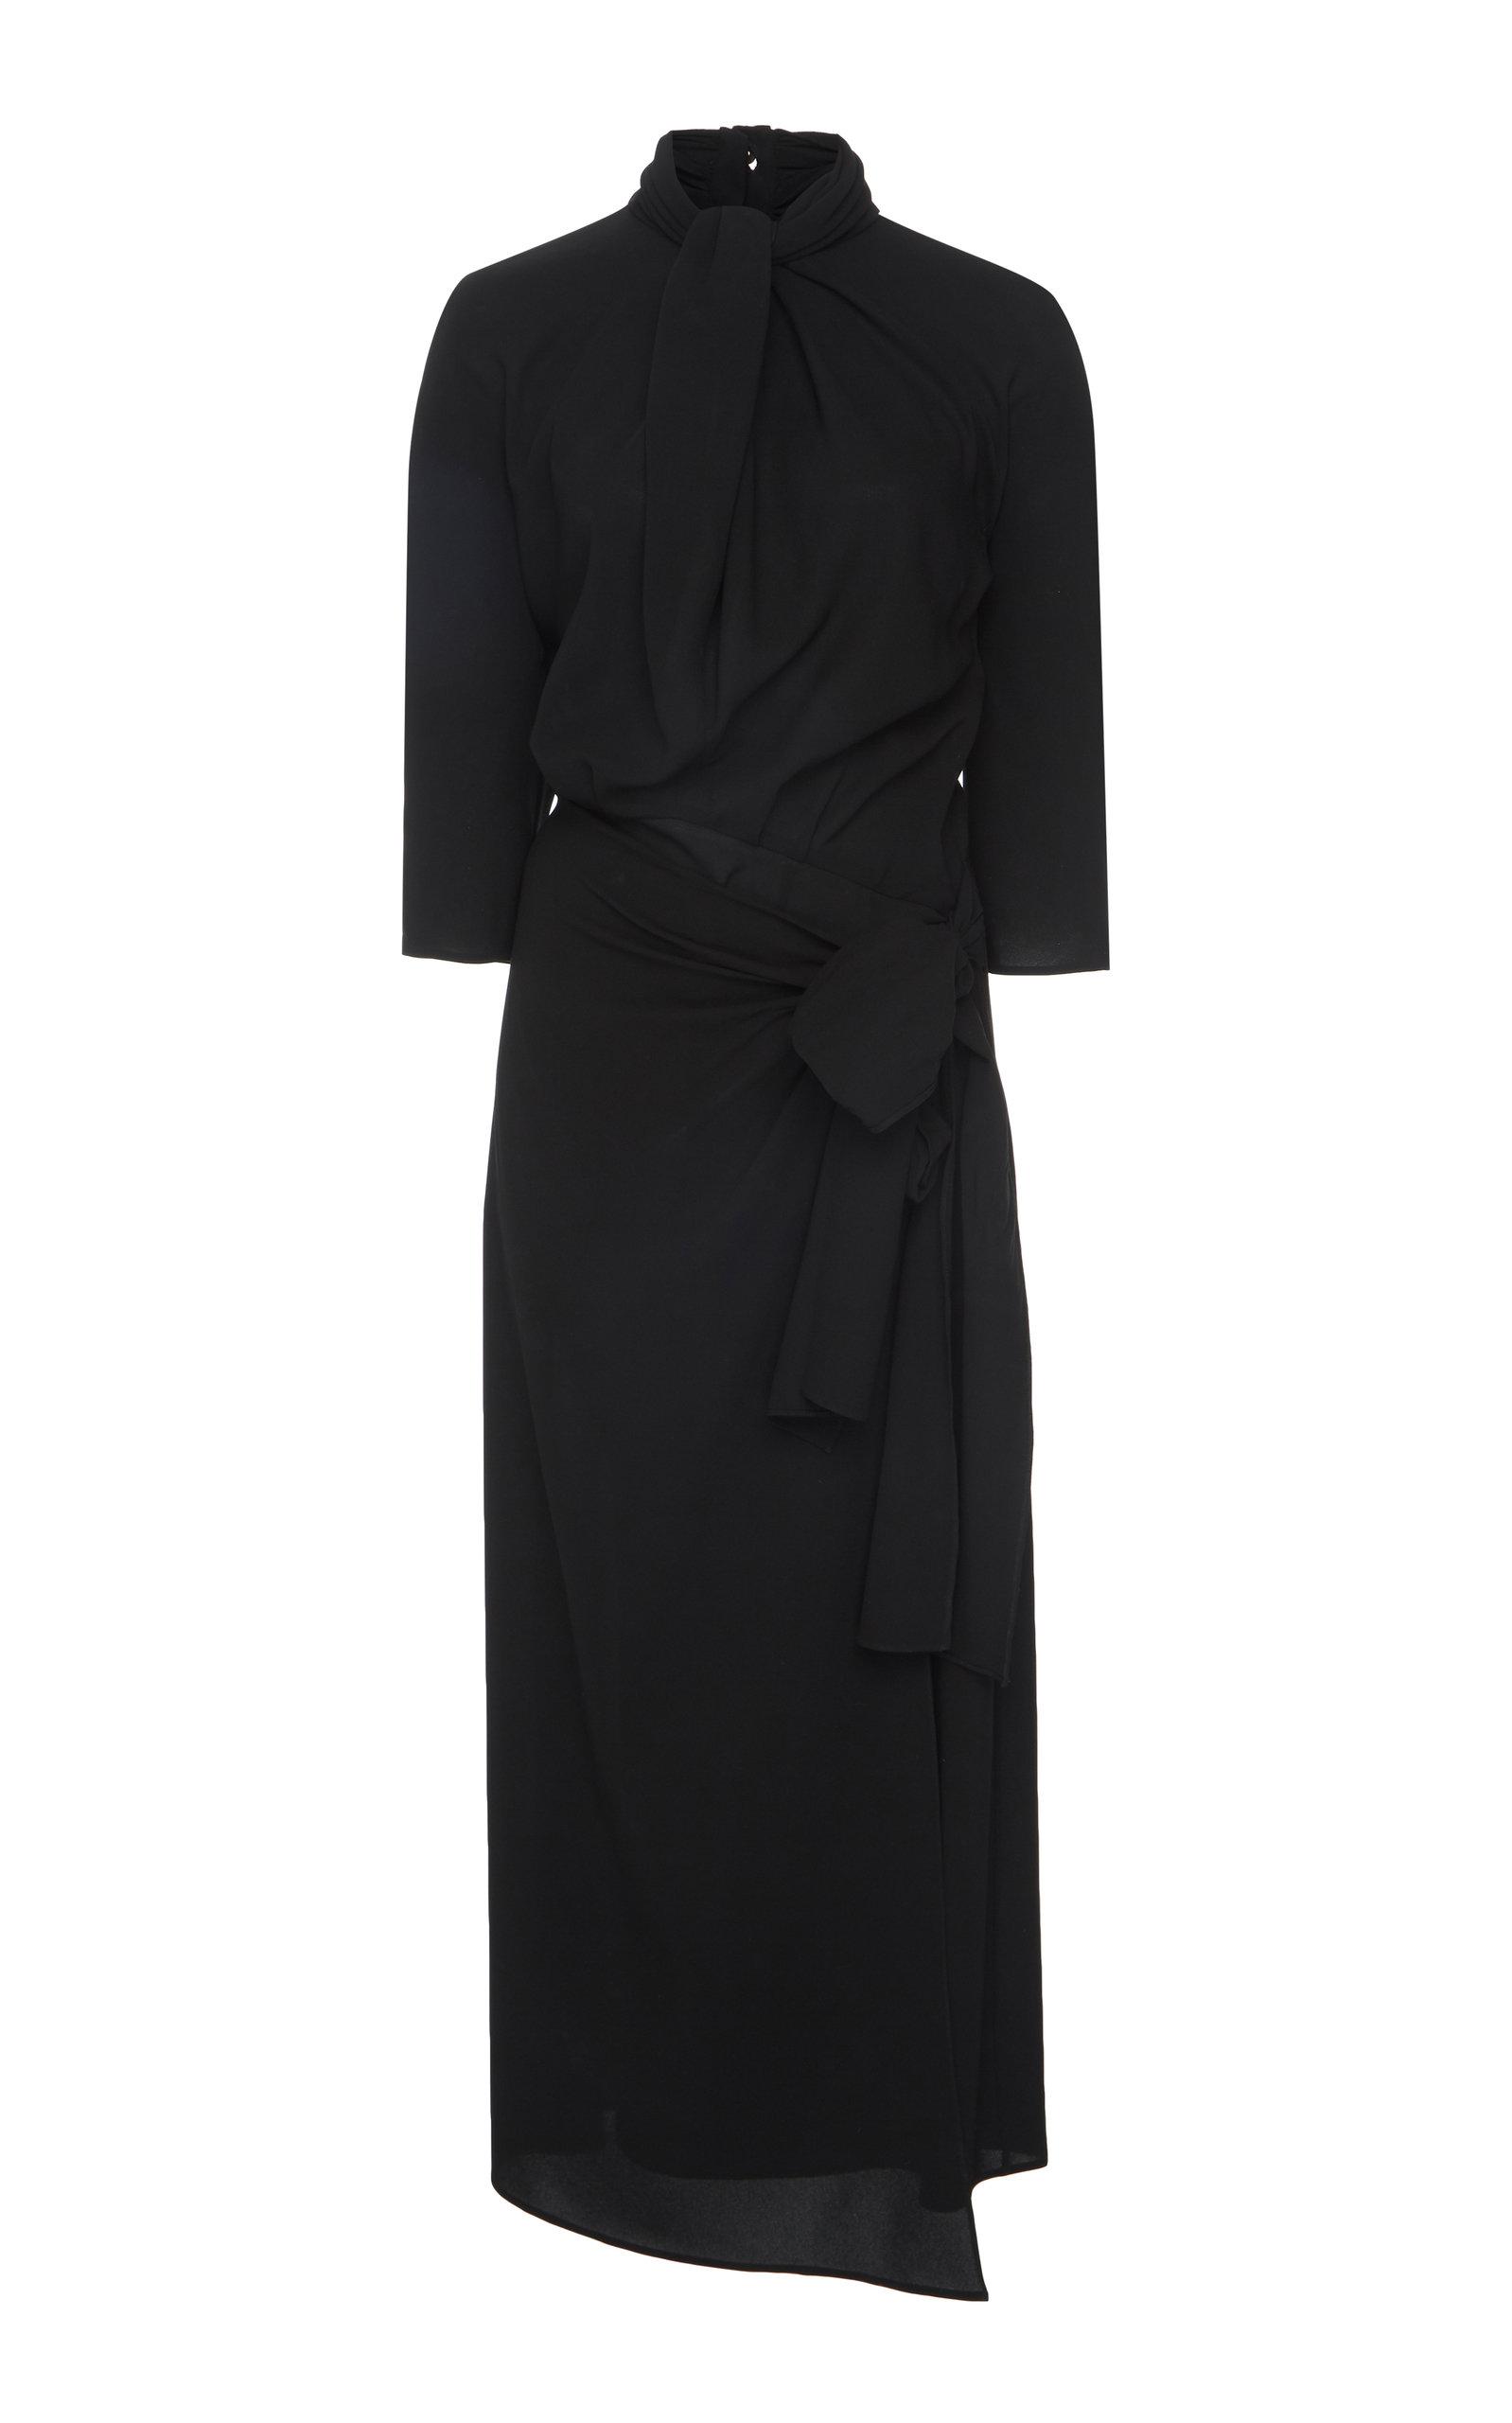 Buy Prada Draped Chiffon Midi Dress online, shop Prada at the best price